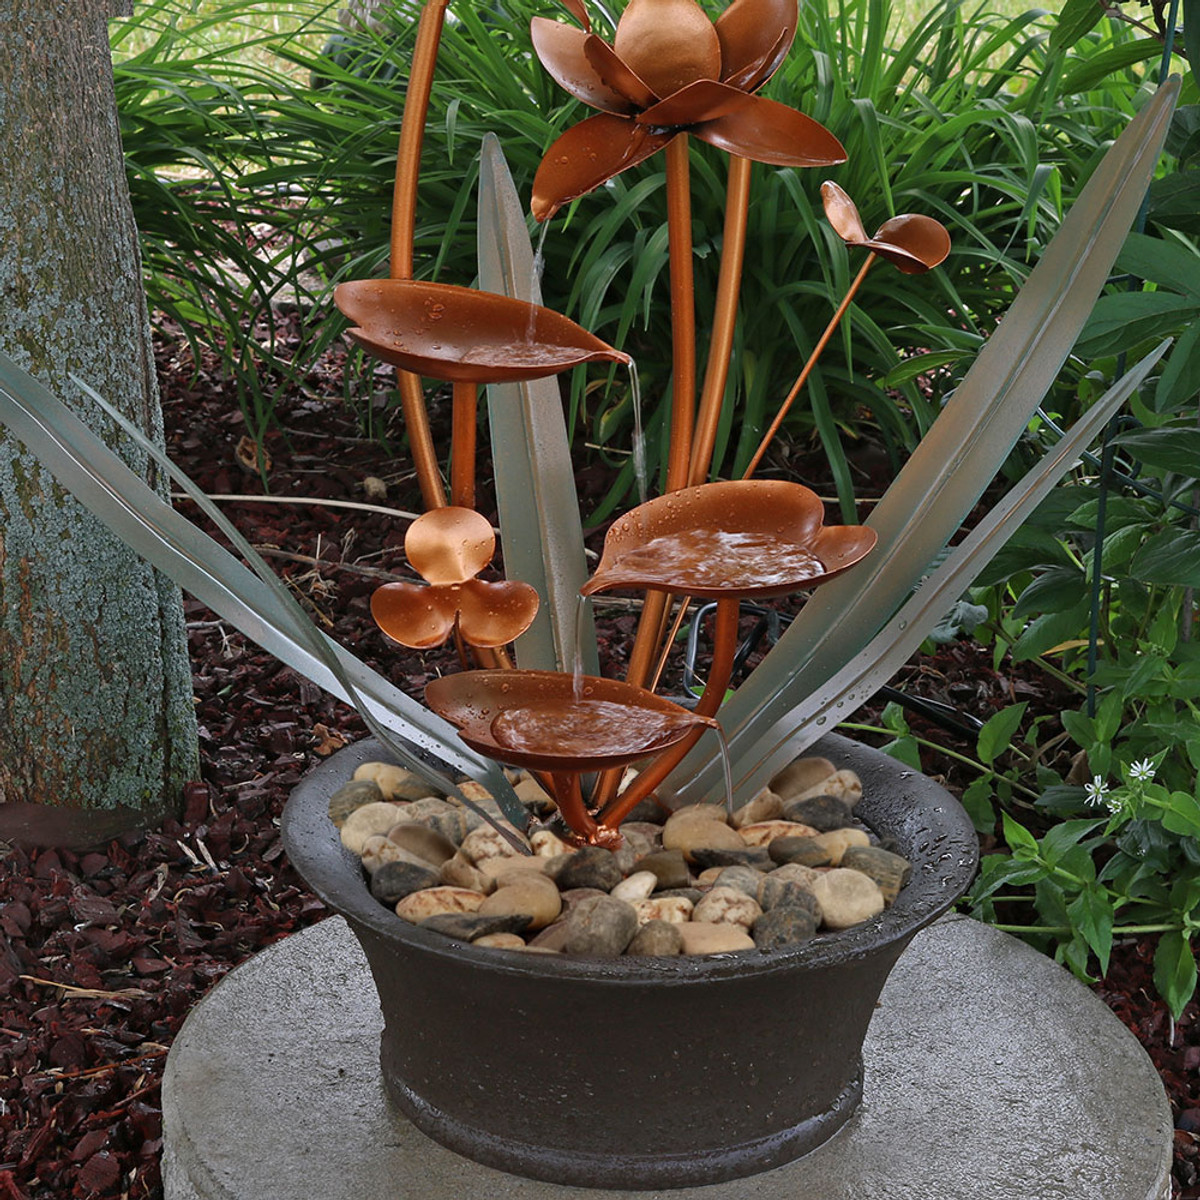 Sunnydaze Copper Flower Blossoms Outdoor Water Fountain